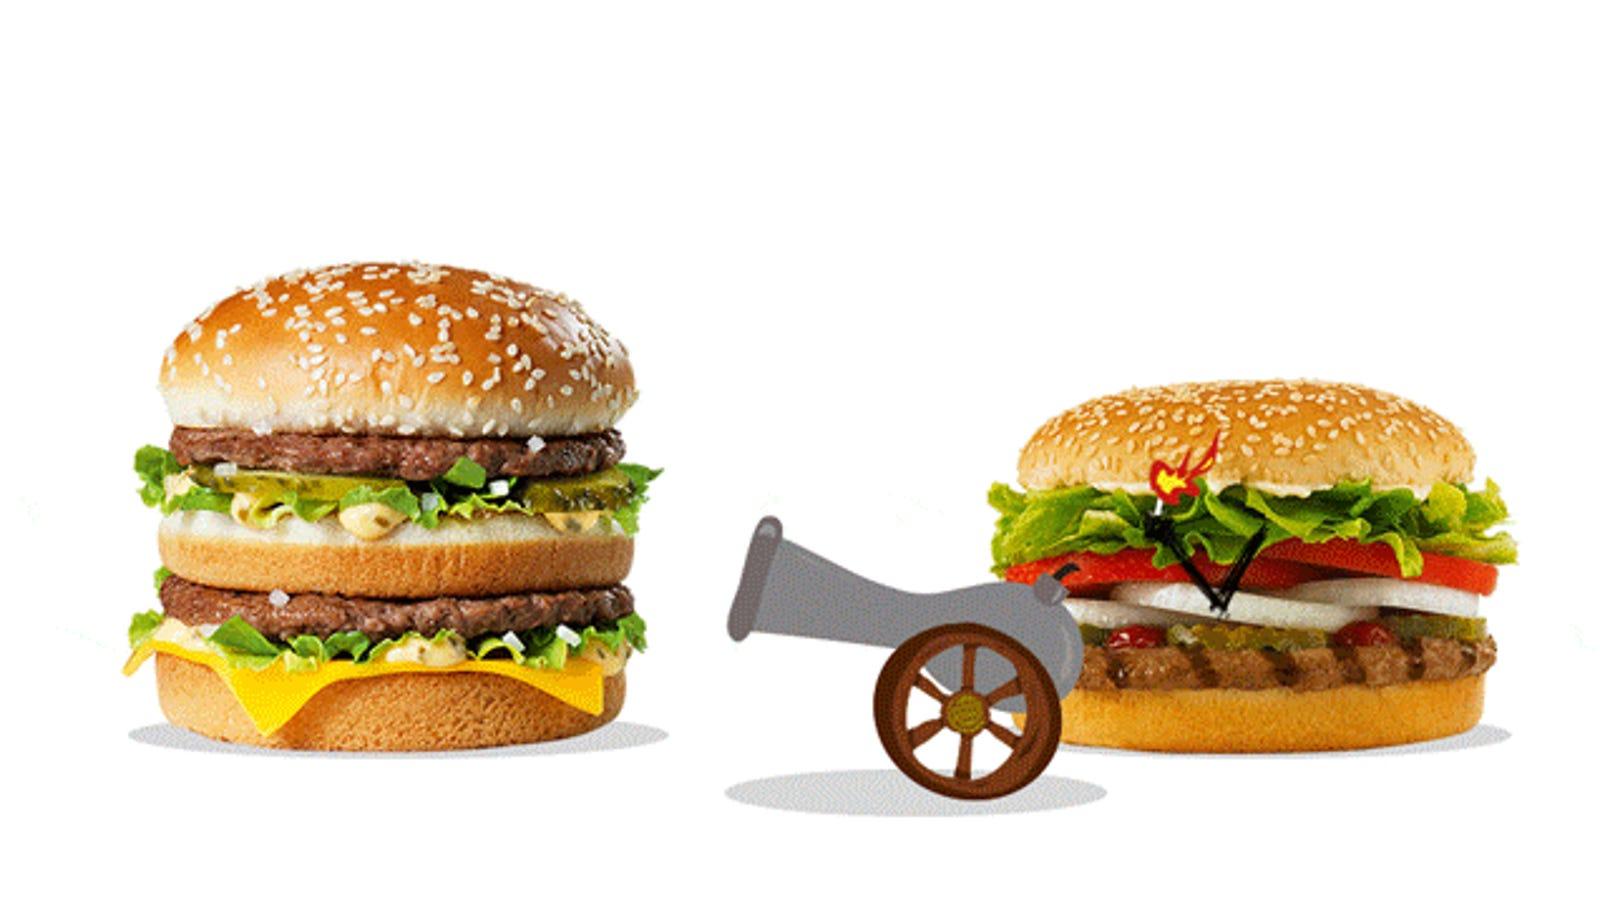 Big Mac Vs. Whopper: The Ultimate Burger Smackdown